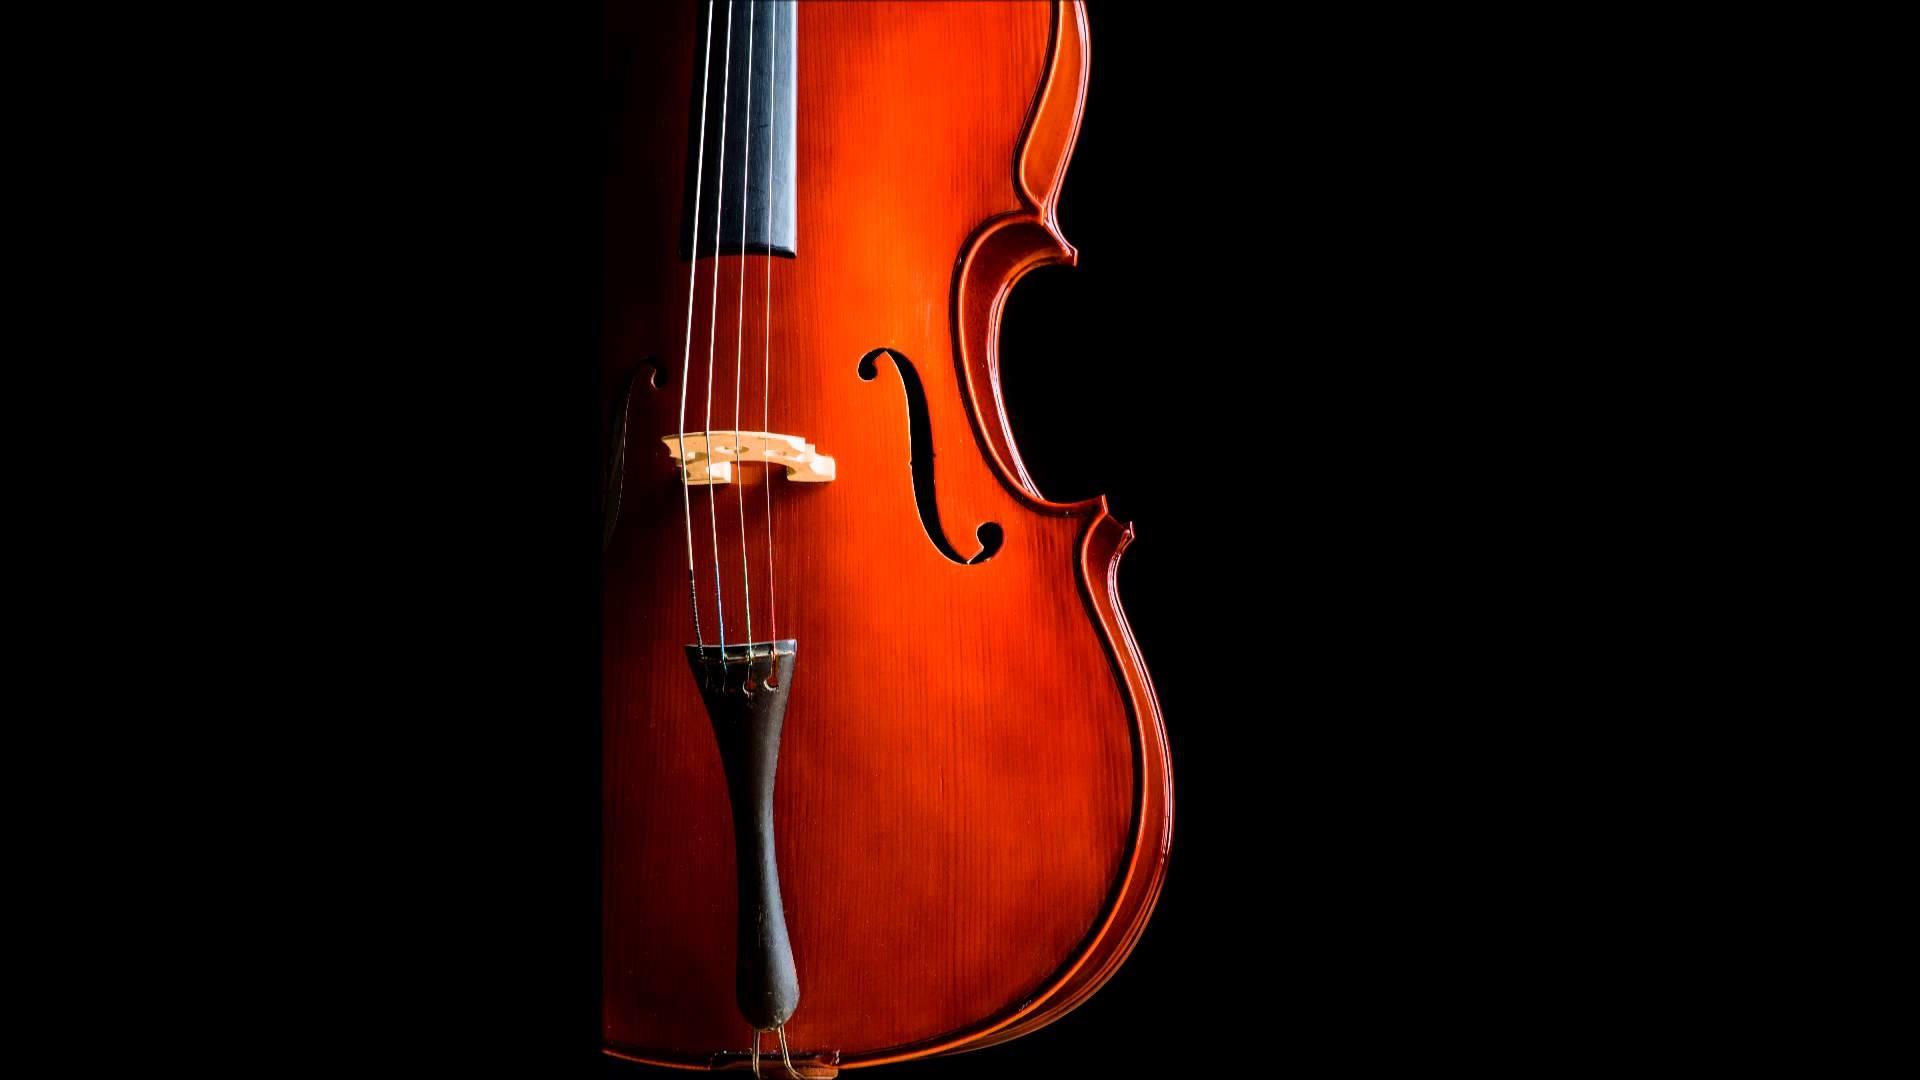 Cello Wallpaper Photo 22287 Hd Pictures: Cello Wallpaper (69+ Images